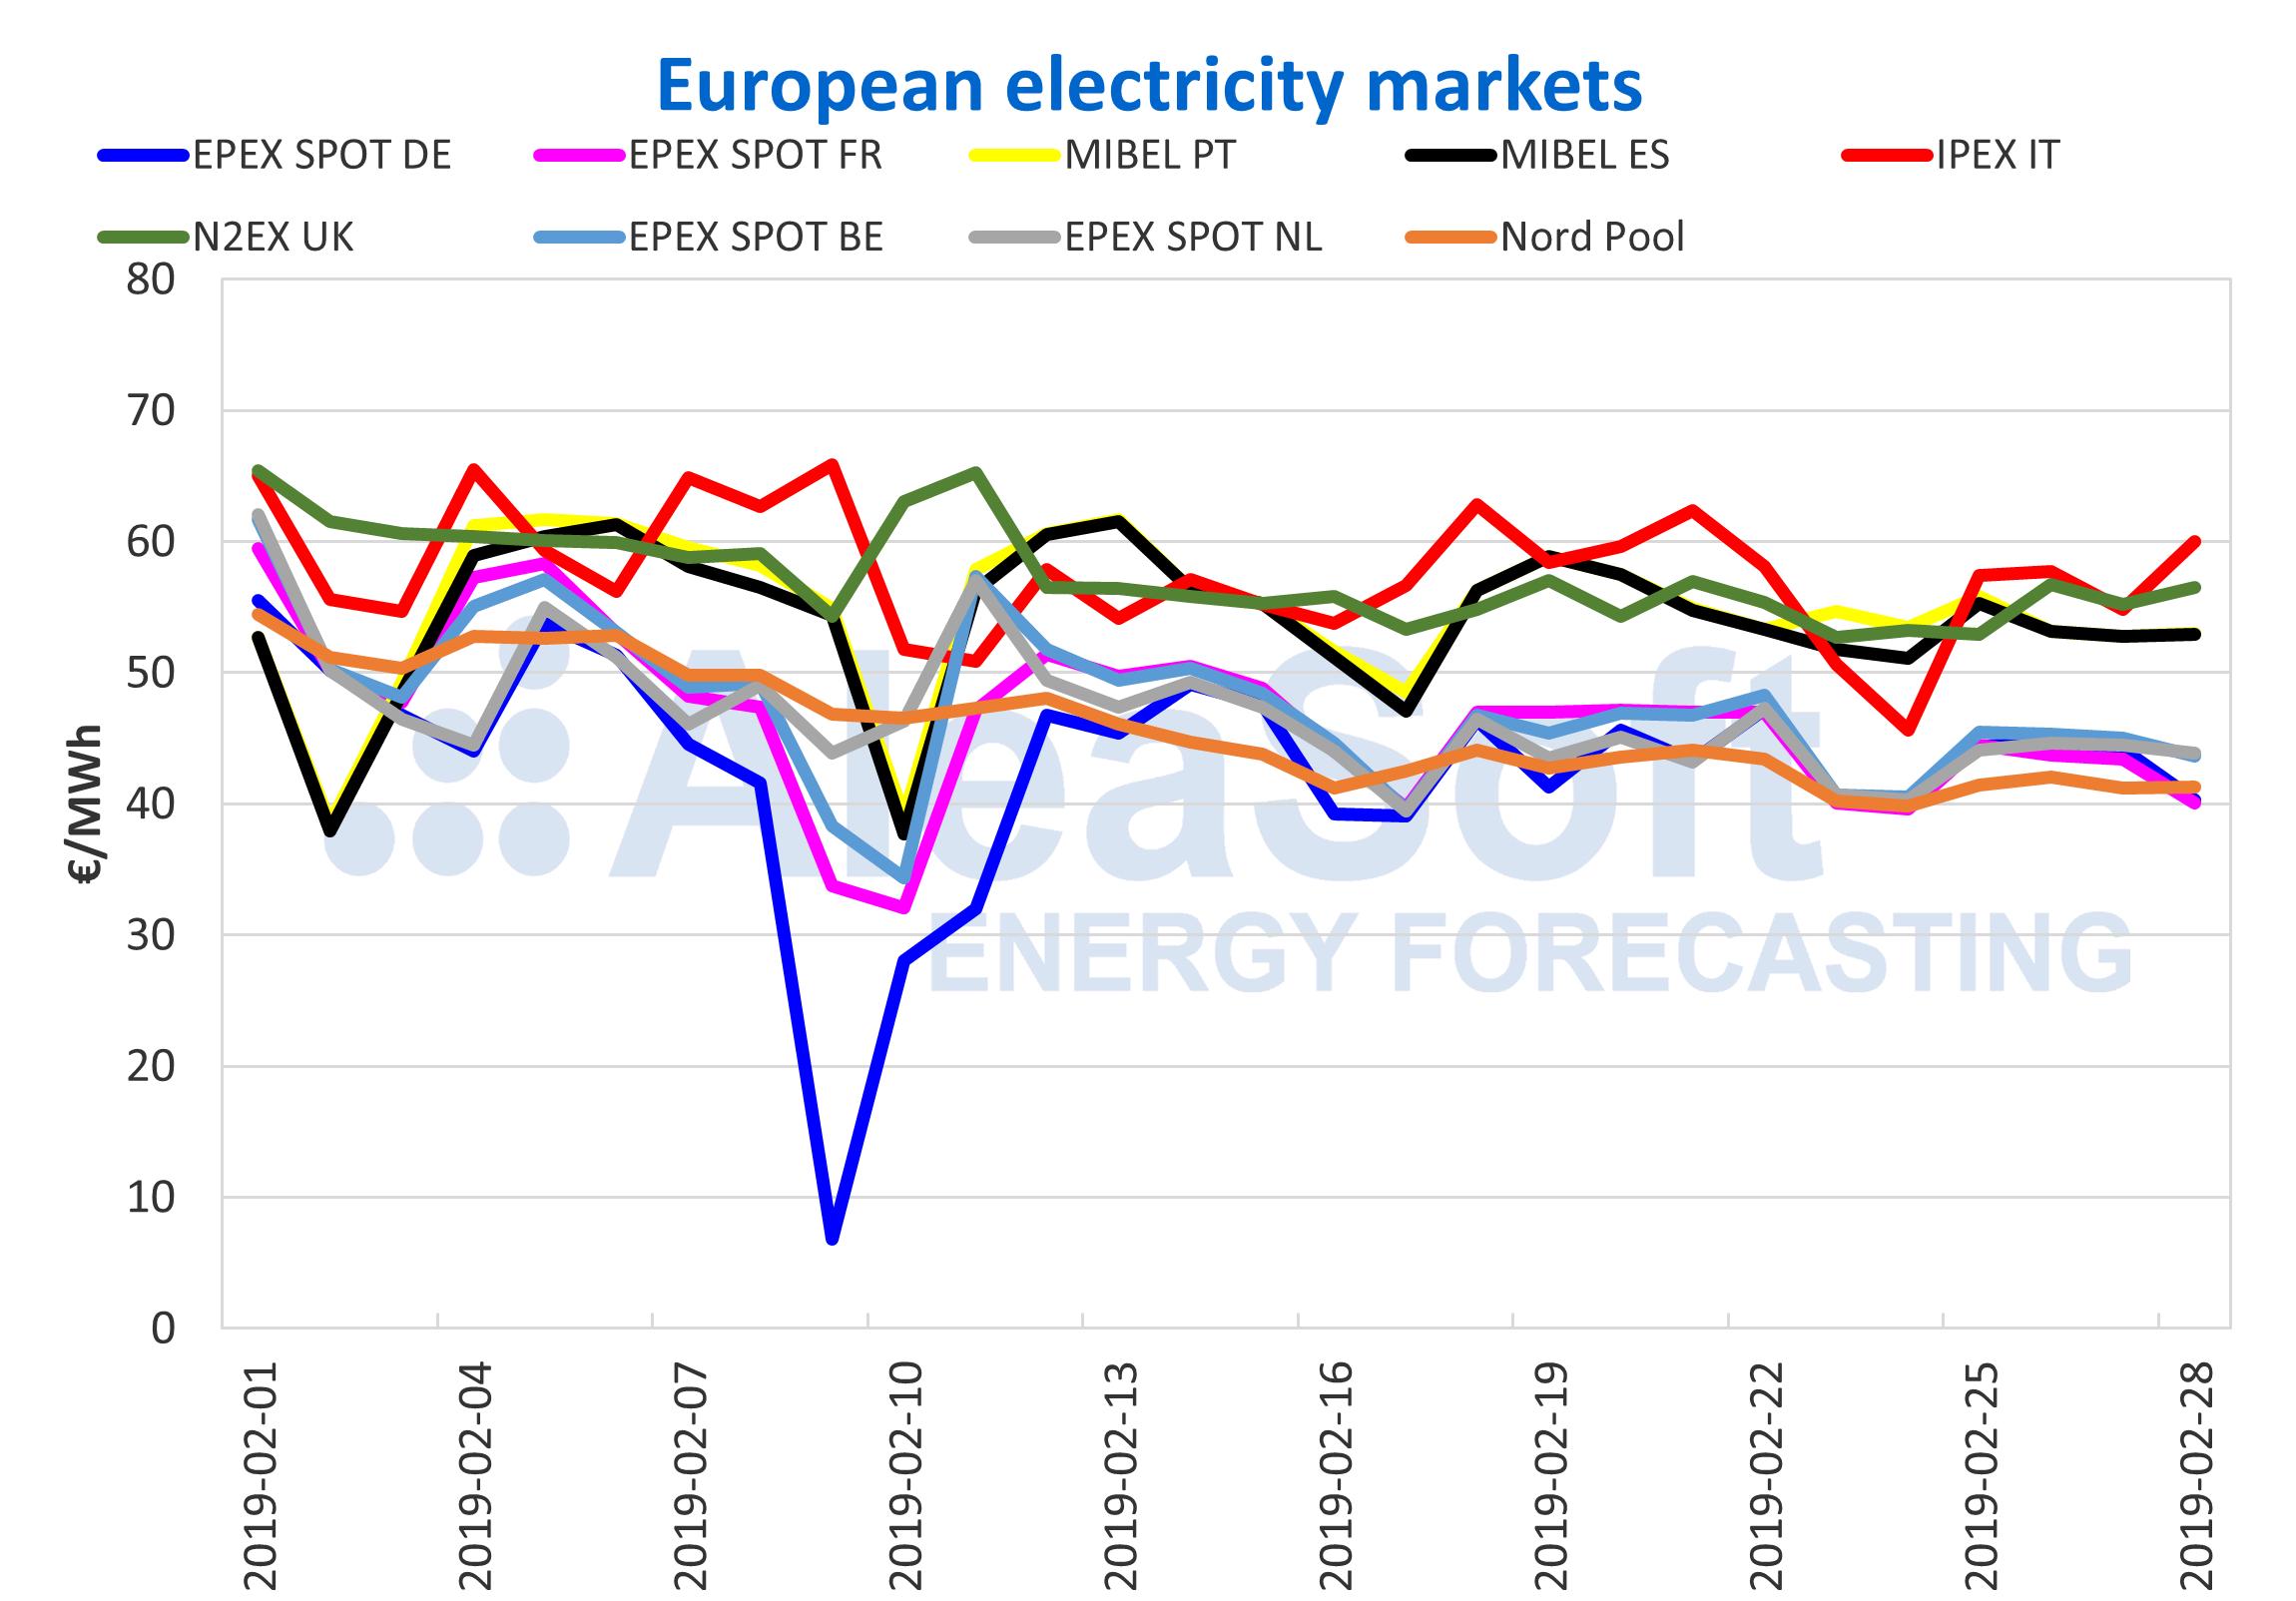 AleaSoft - European electricity market price